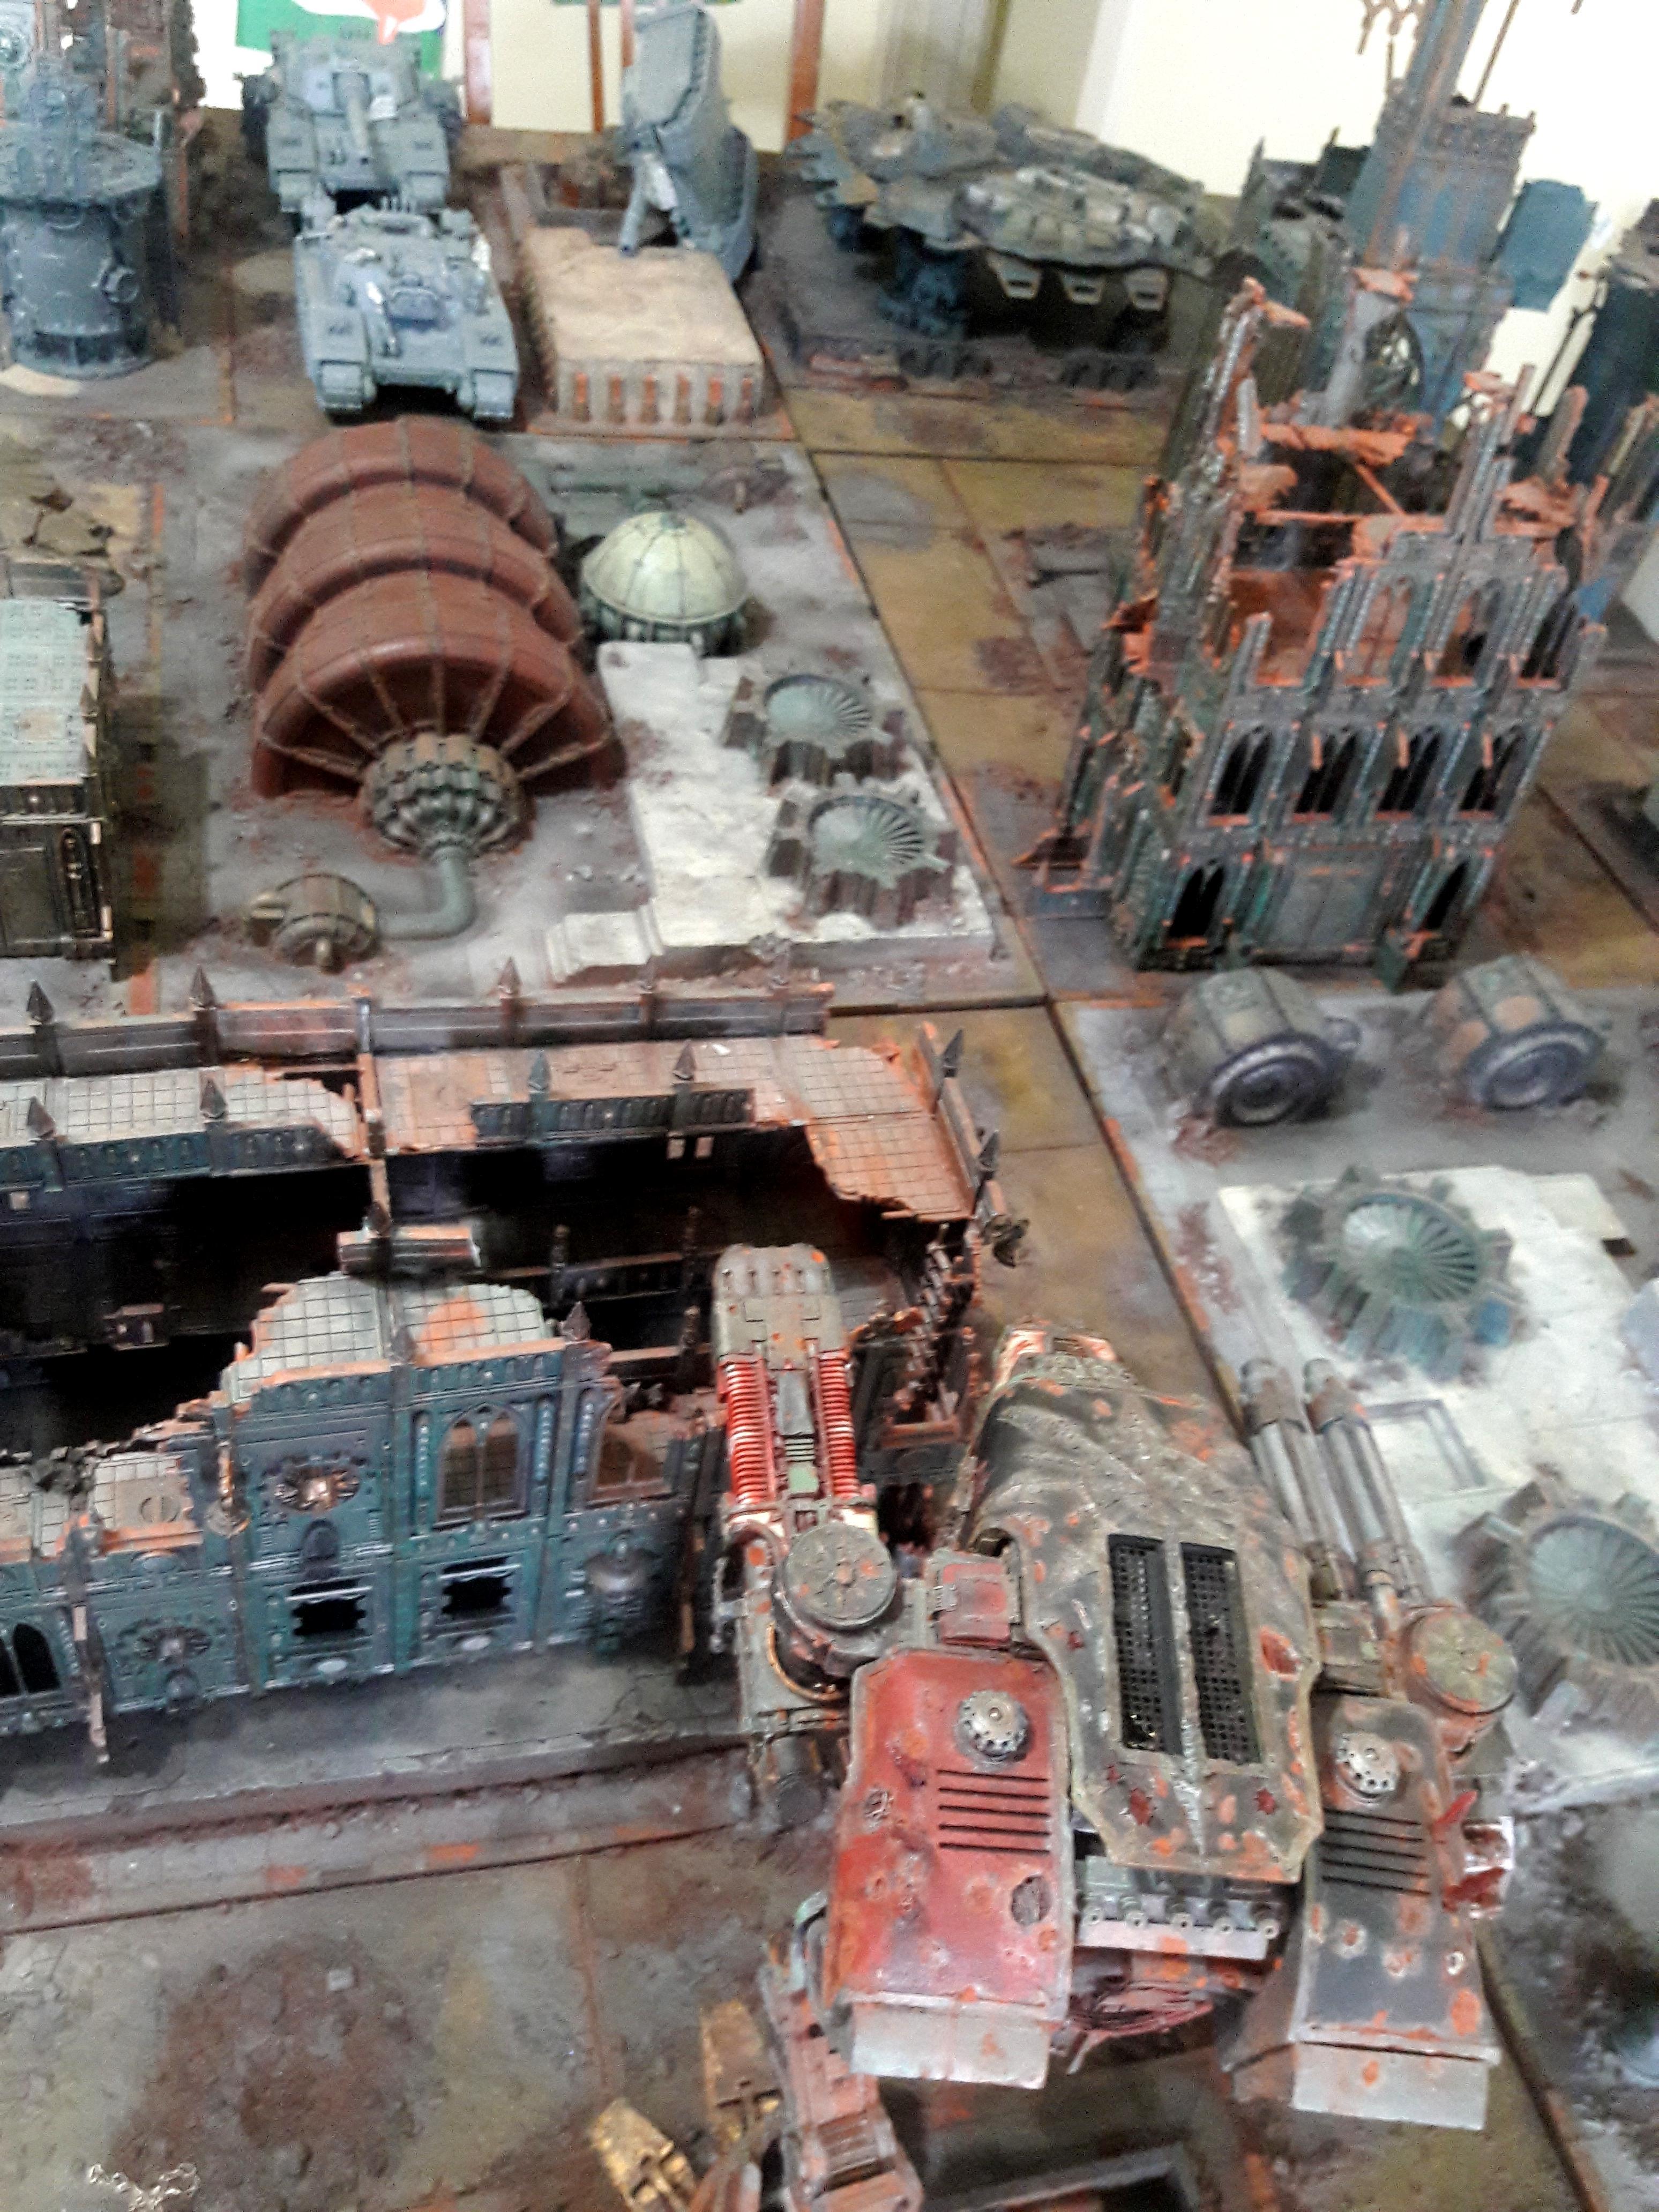 Cities Of Death, Forge World, Imperial Industrial Sector, Kill Team, Legio Mortis, Terrain, Titan, Warhammer 40,000, Warhound